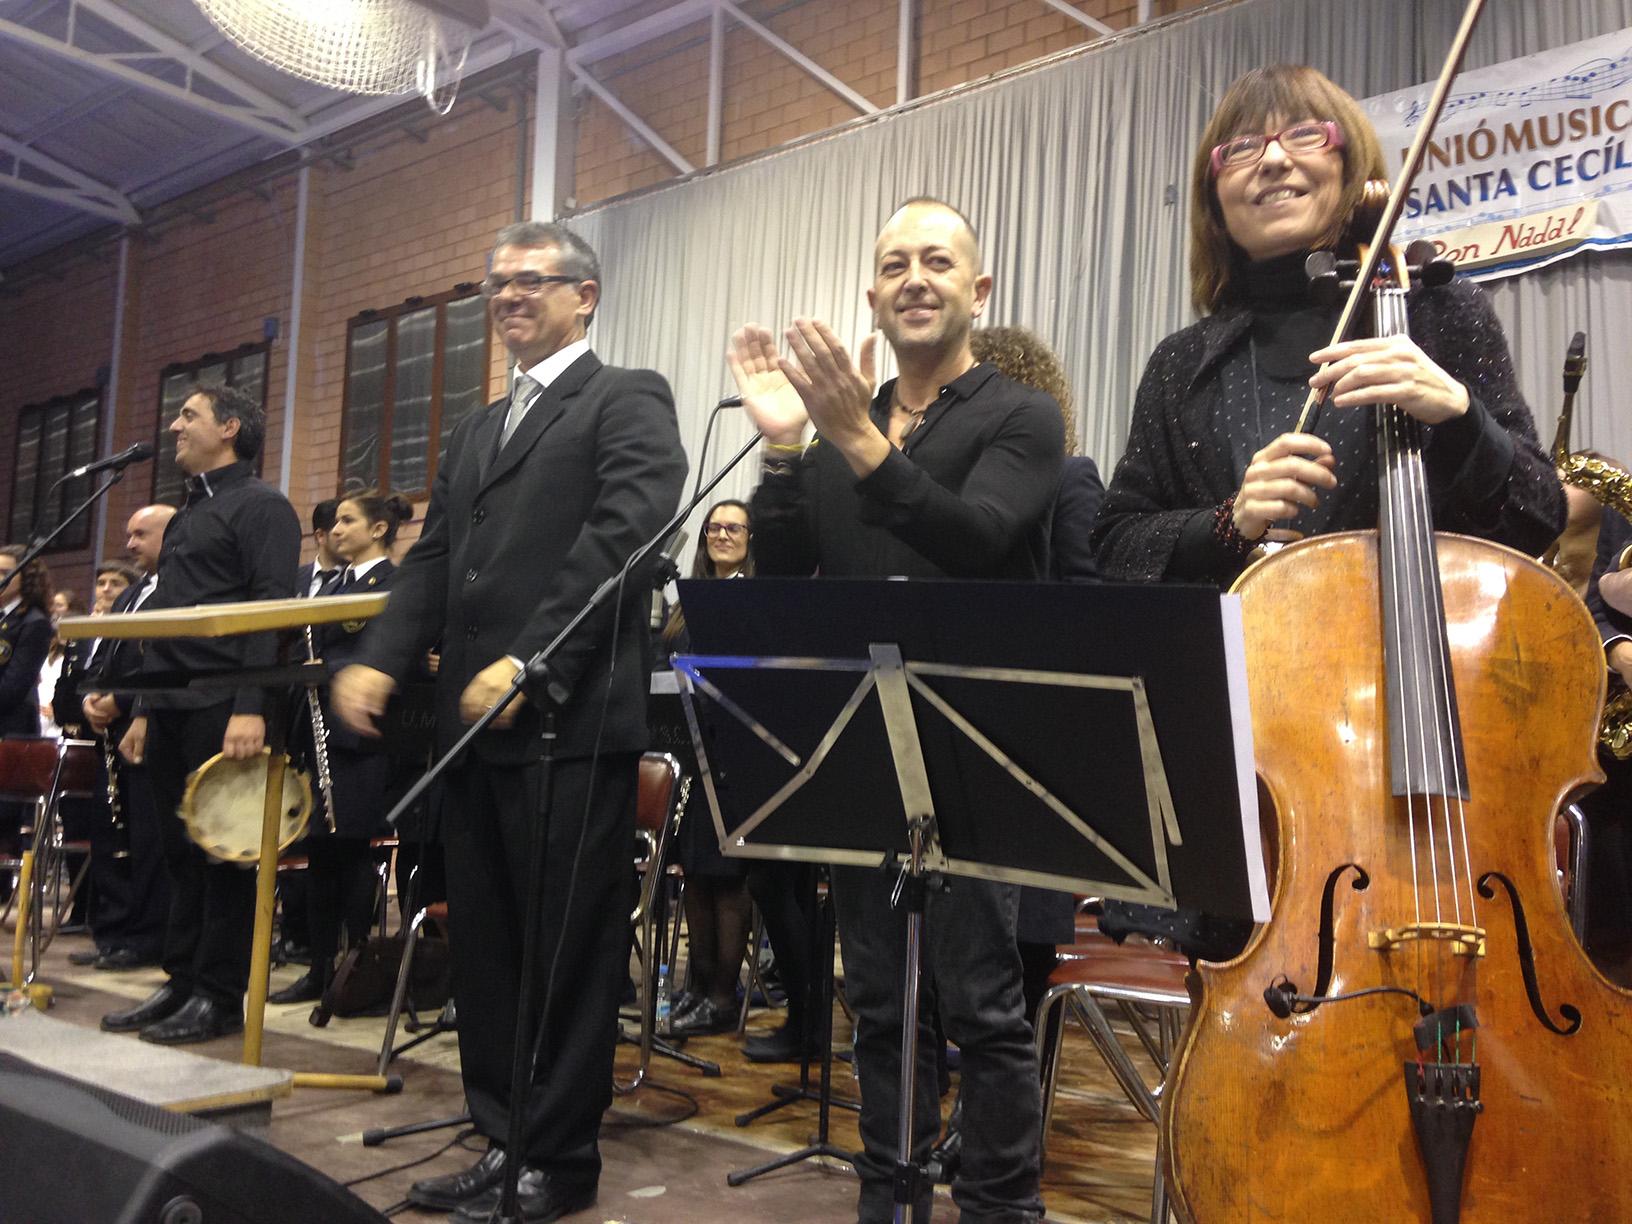 2014-12-21 Disc Botifarra-Ja Ve Nadal a Canals (112)